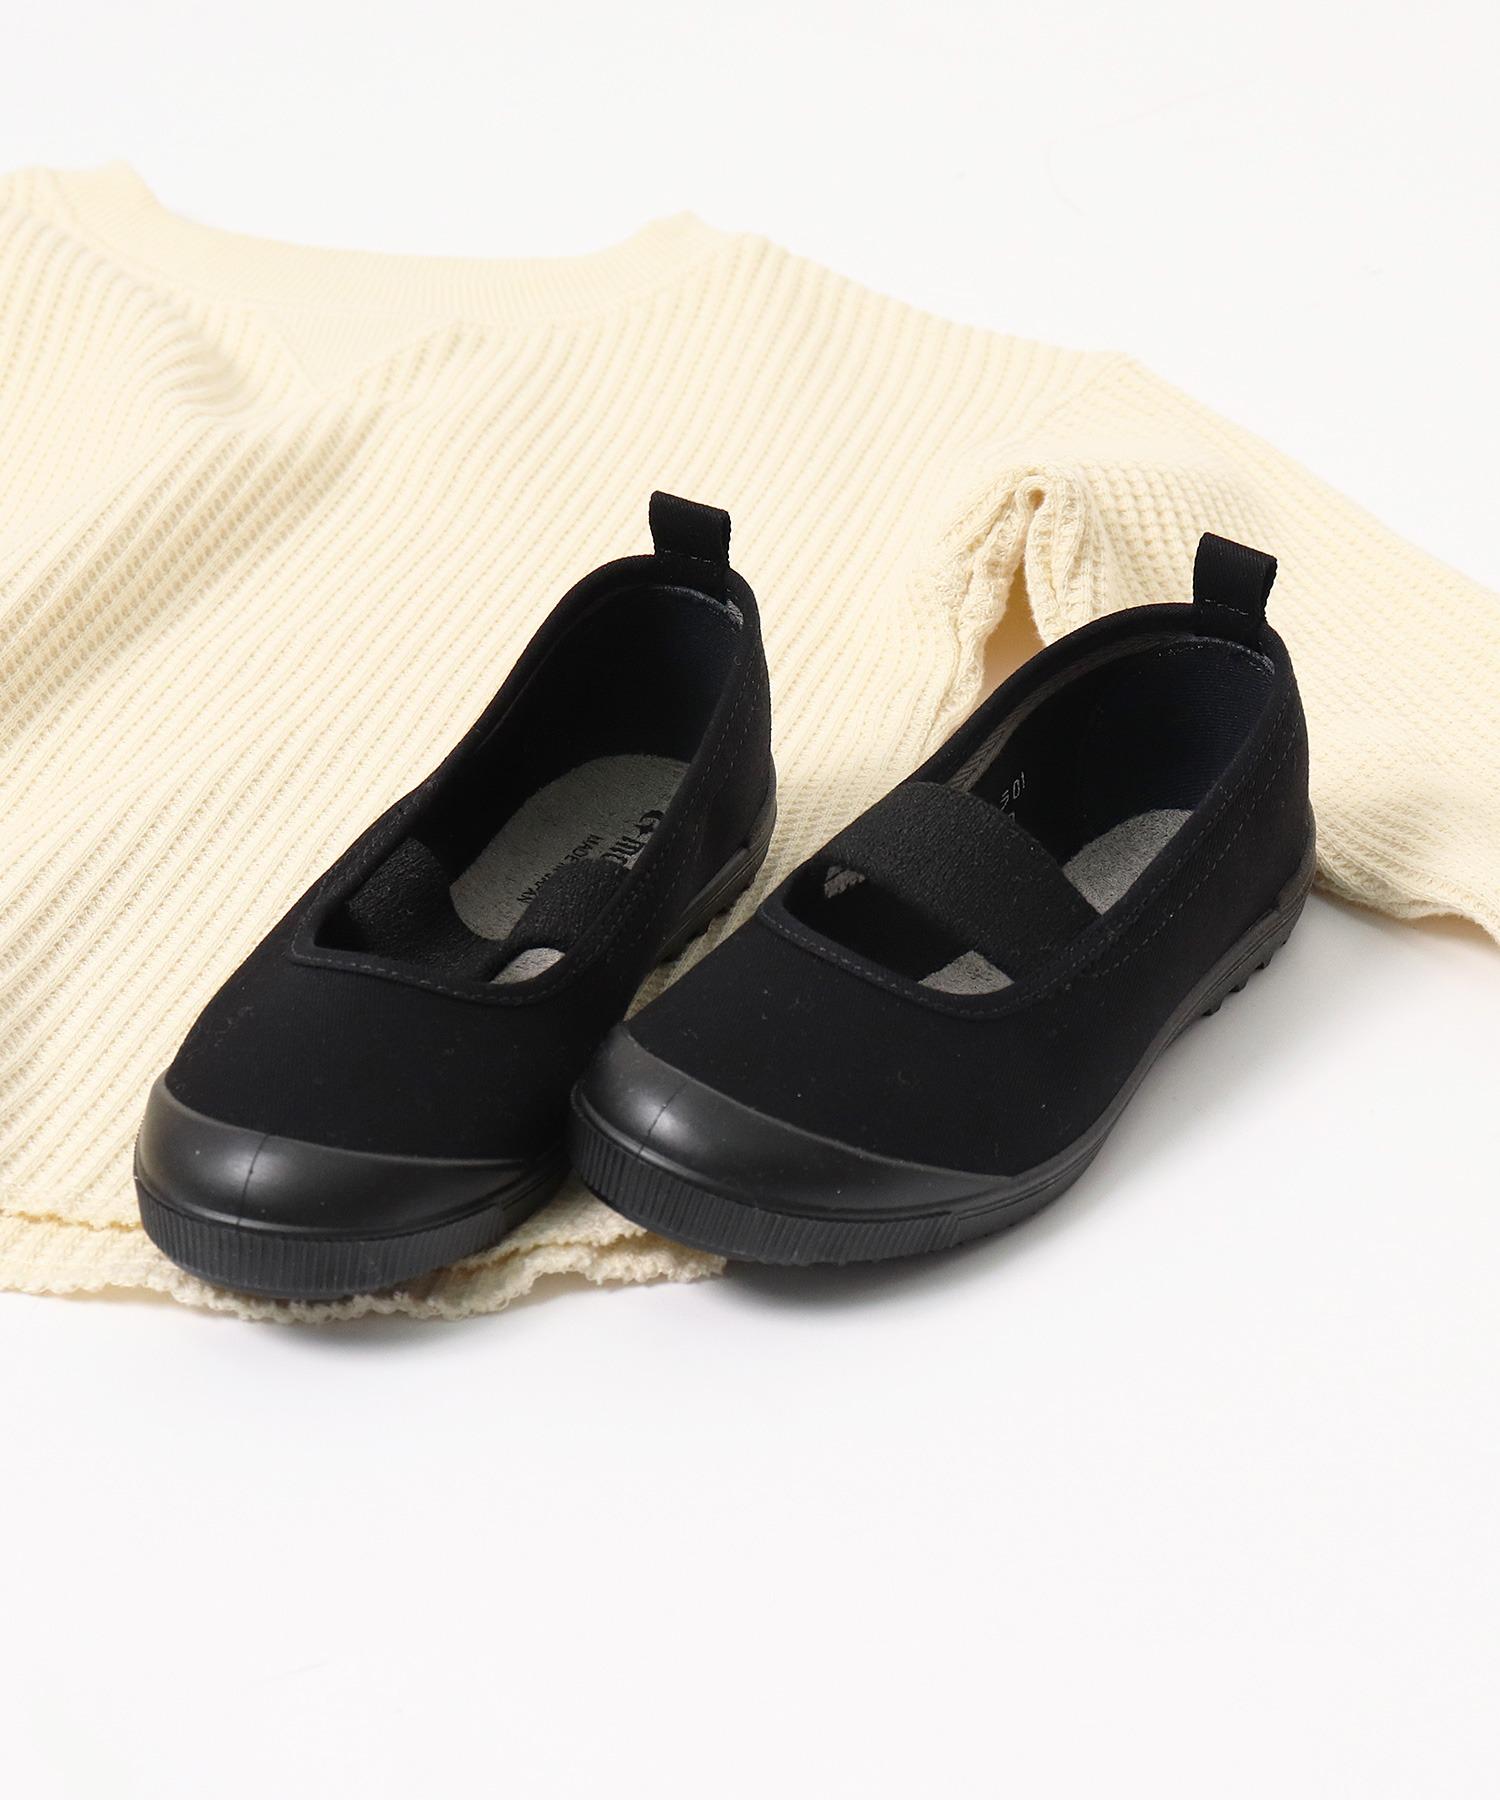 【MOONSTAR / ムーンスター】KIDS BALLET 上履きスニーカー